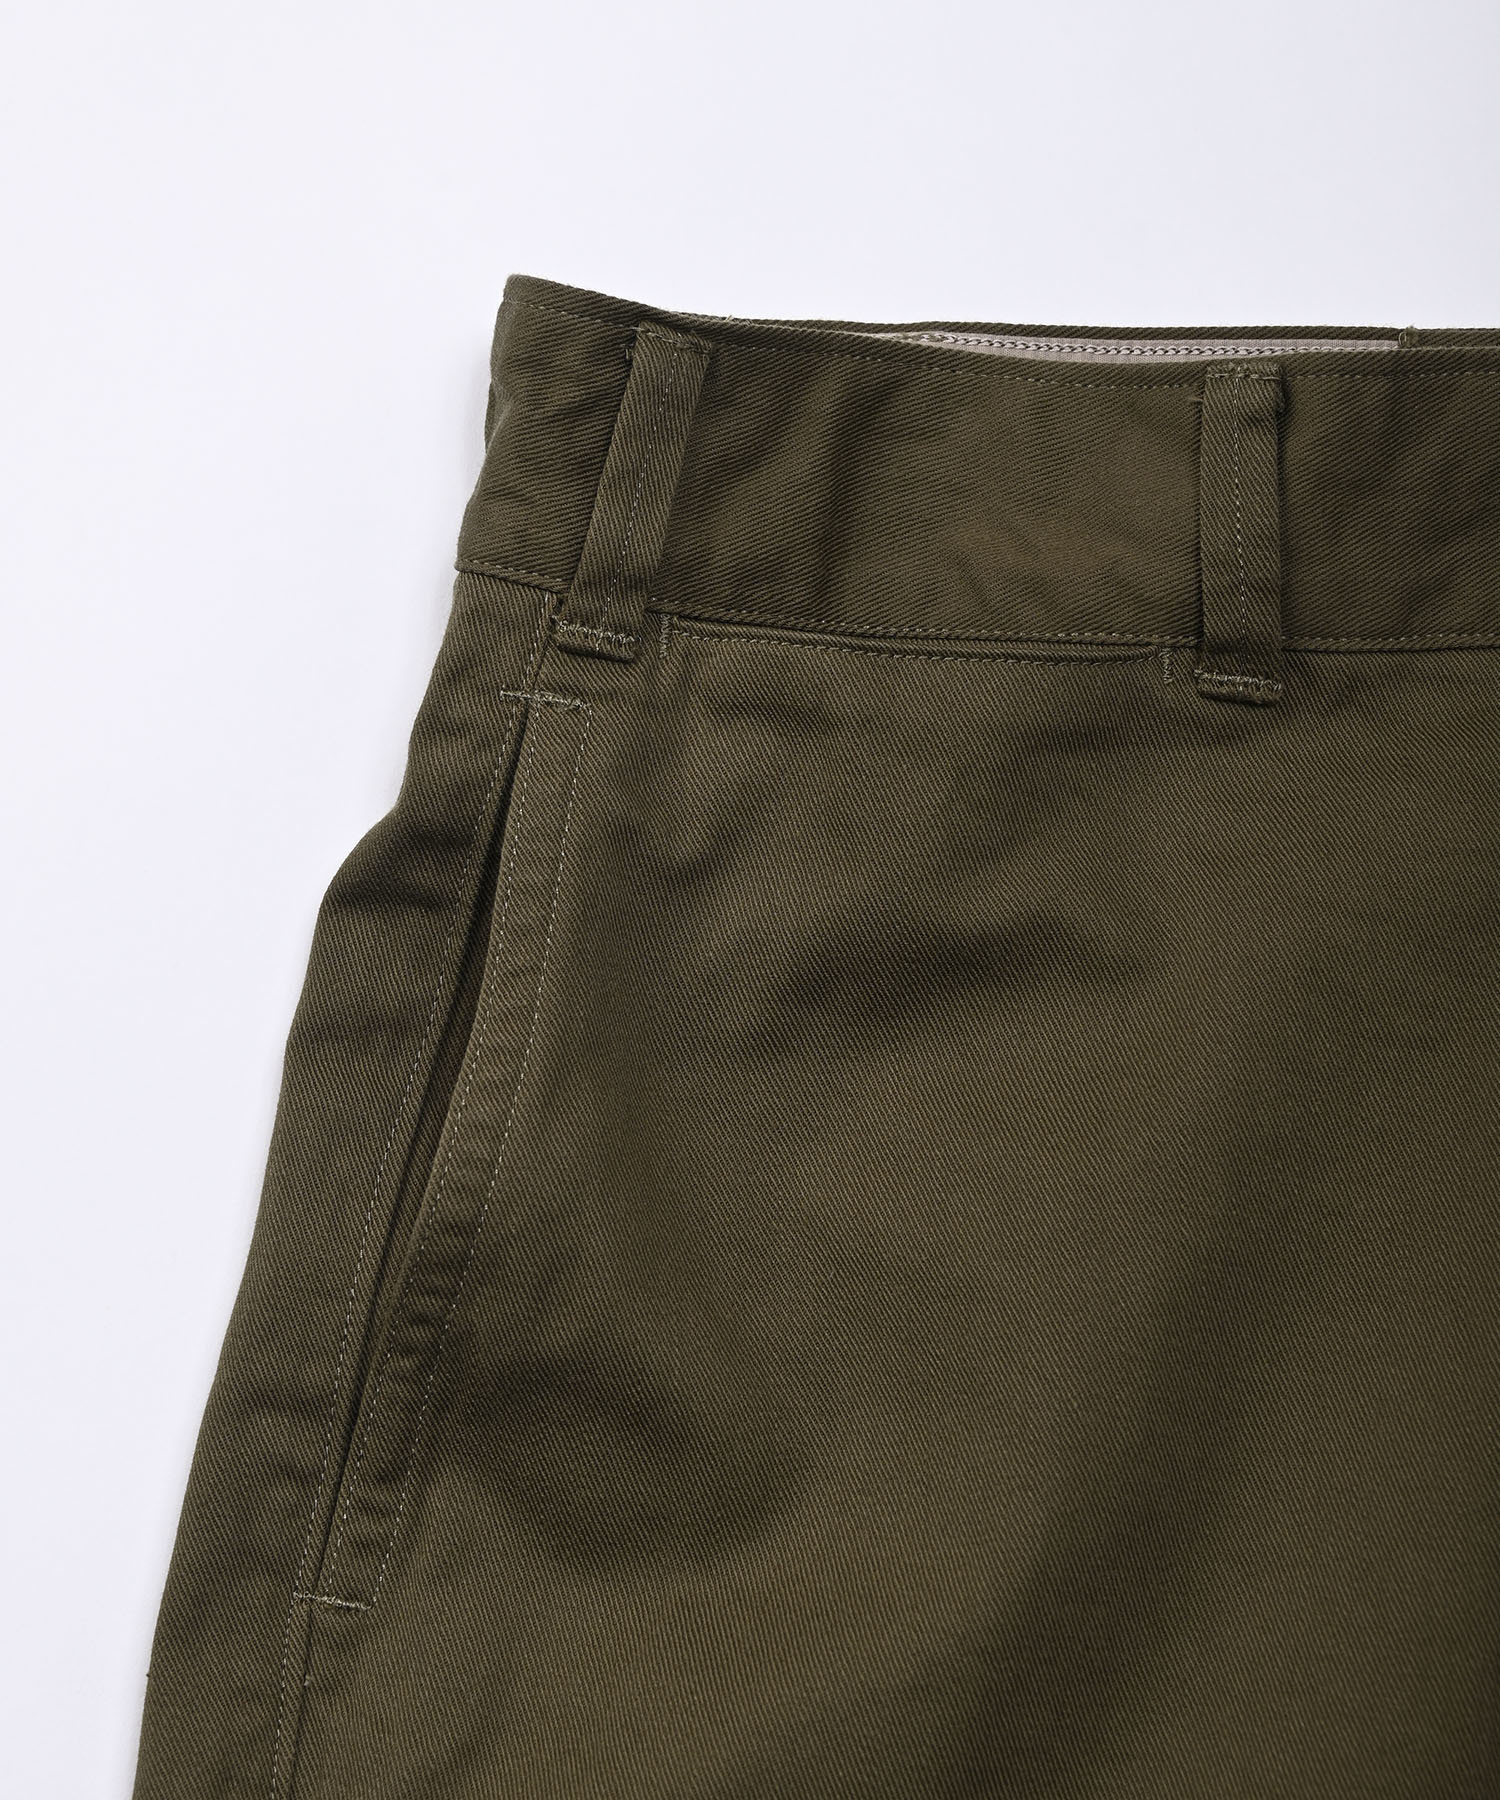 Okome Chino 908 Pants (0421)-10